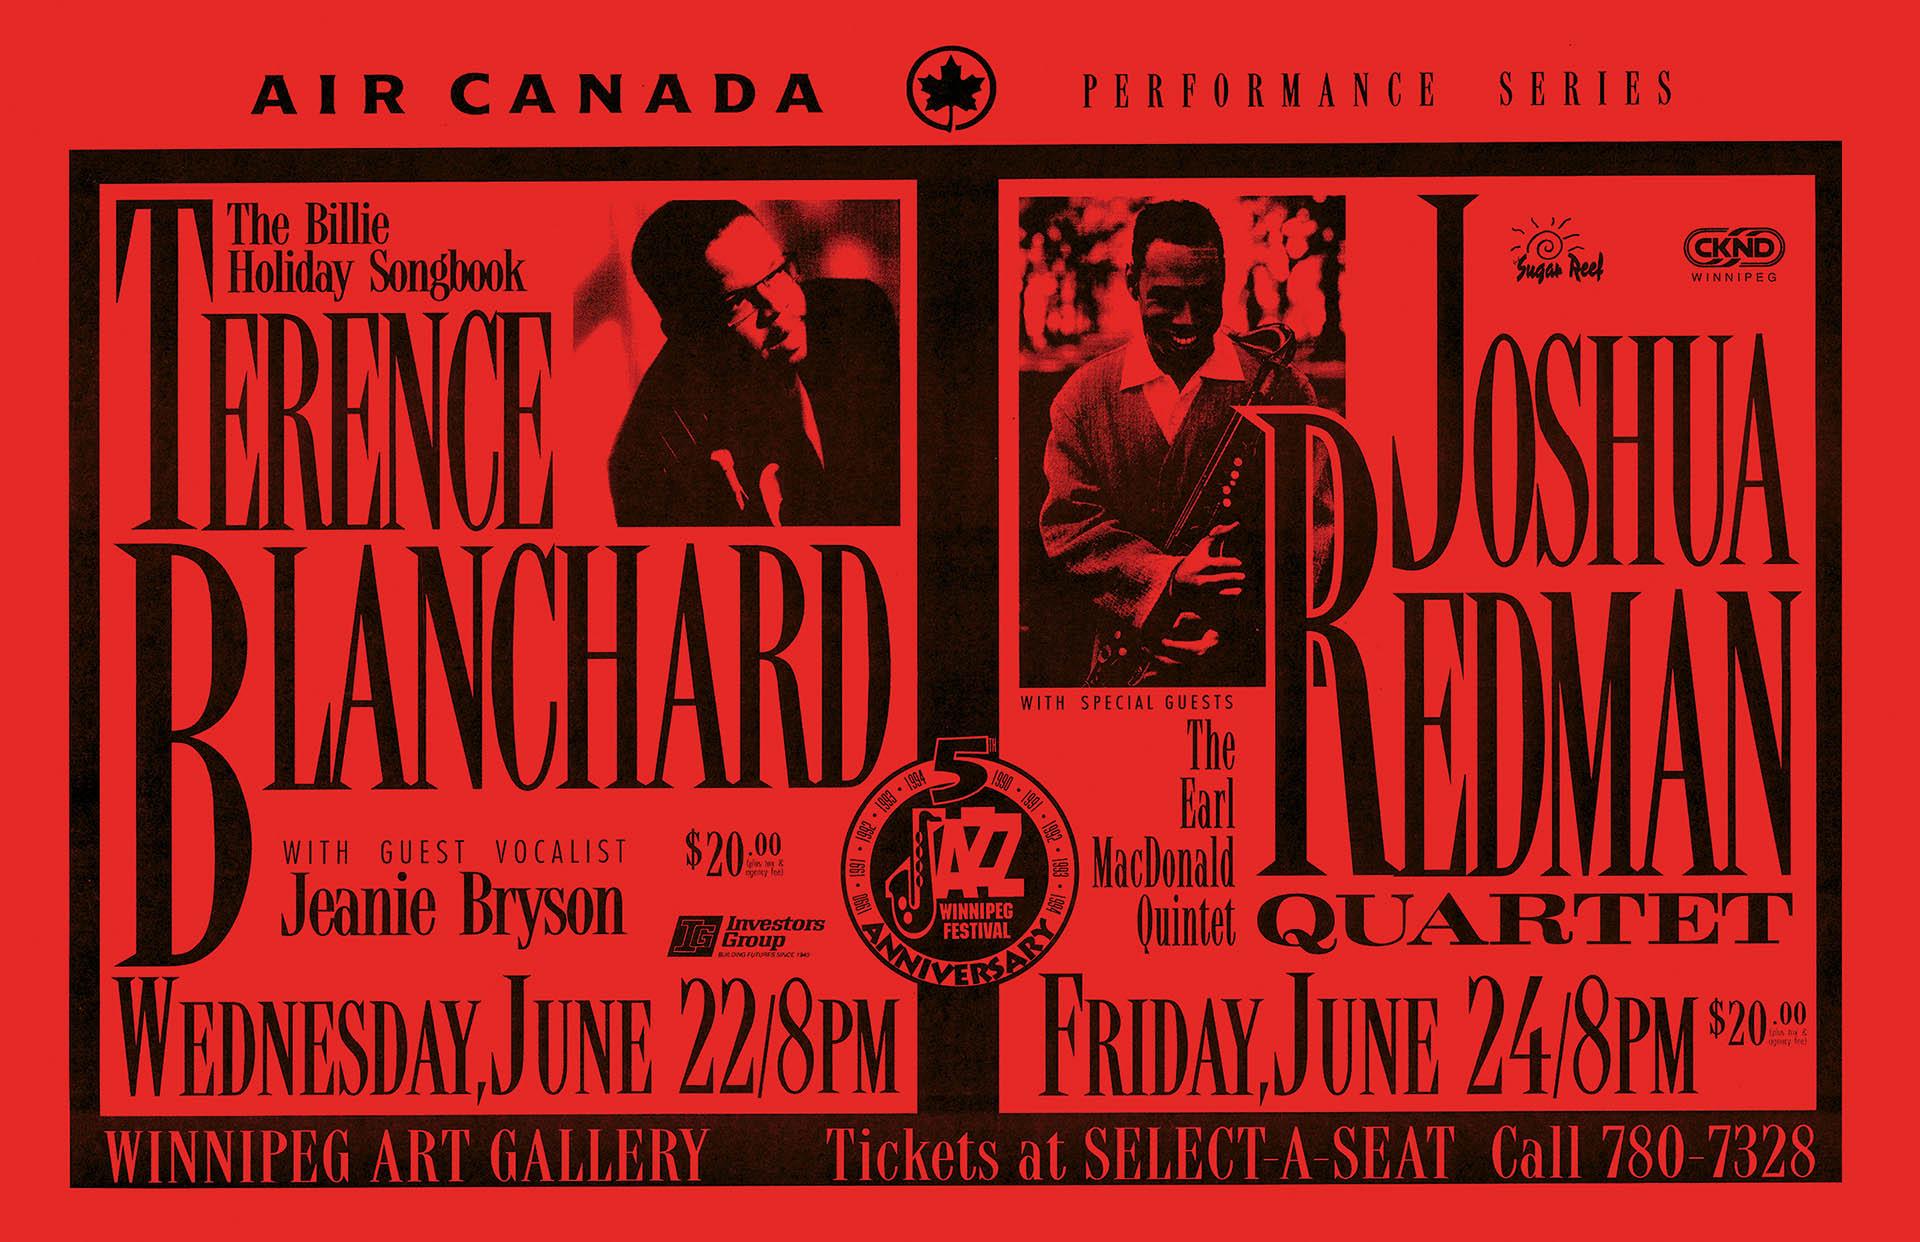 Terrance Blanchard & Joshua Redman - 1994